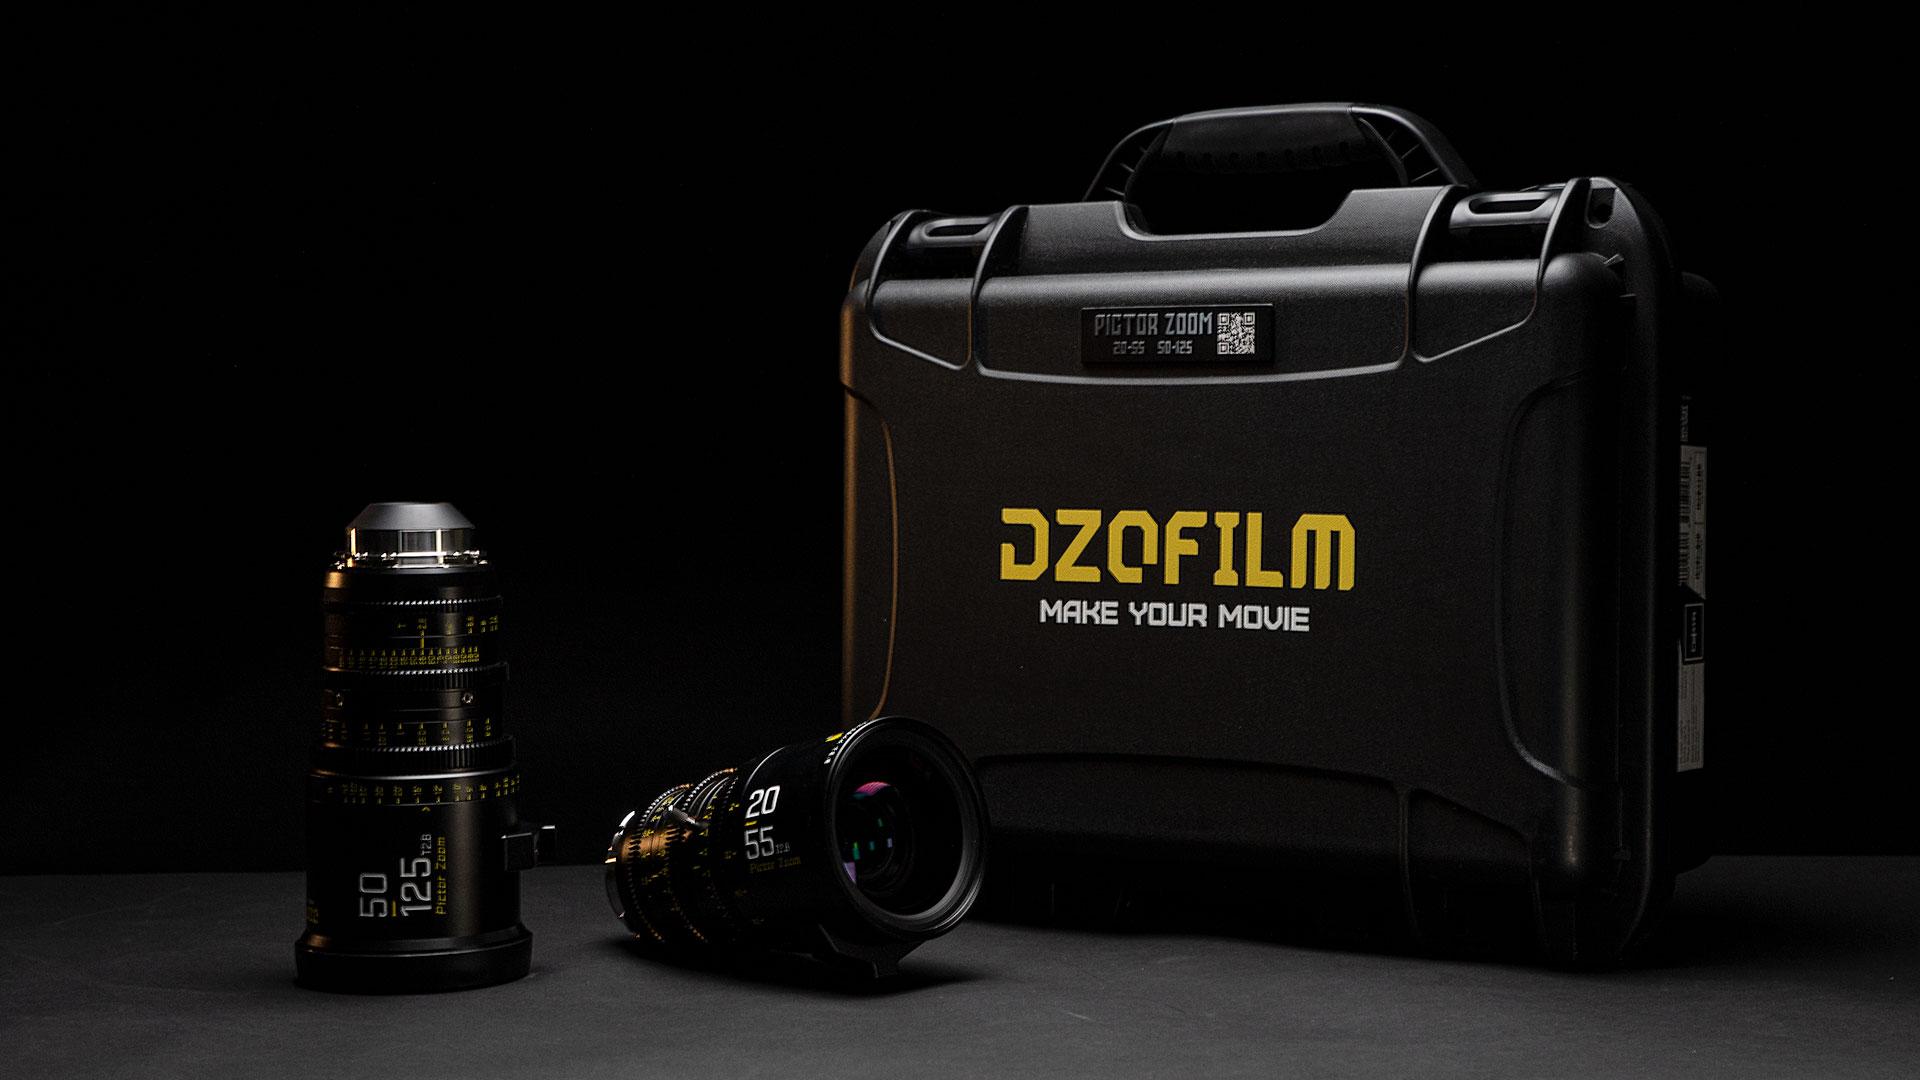 Pictor DZOFILMS lenses